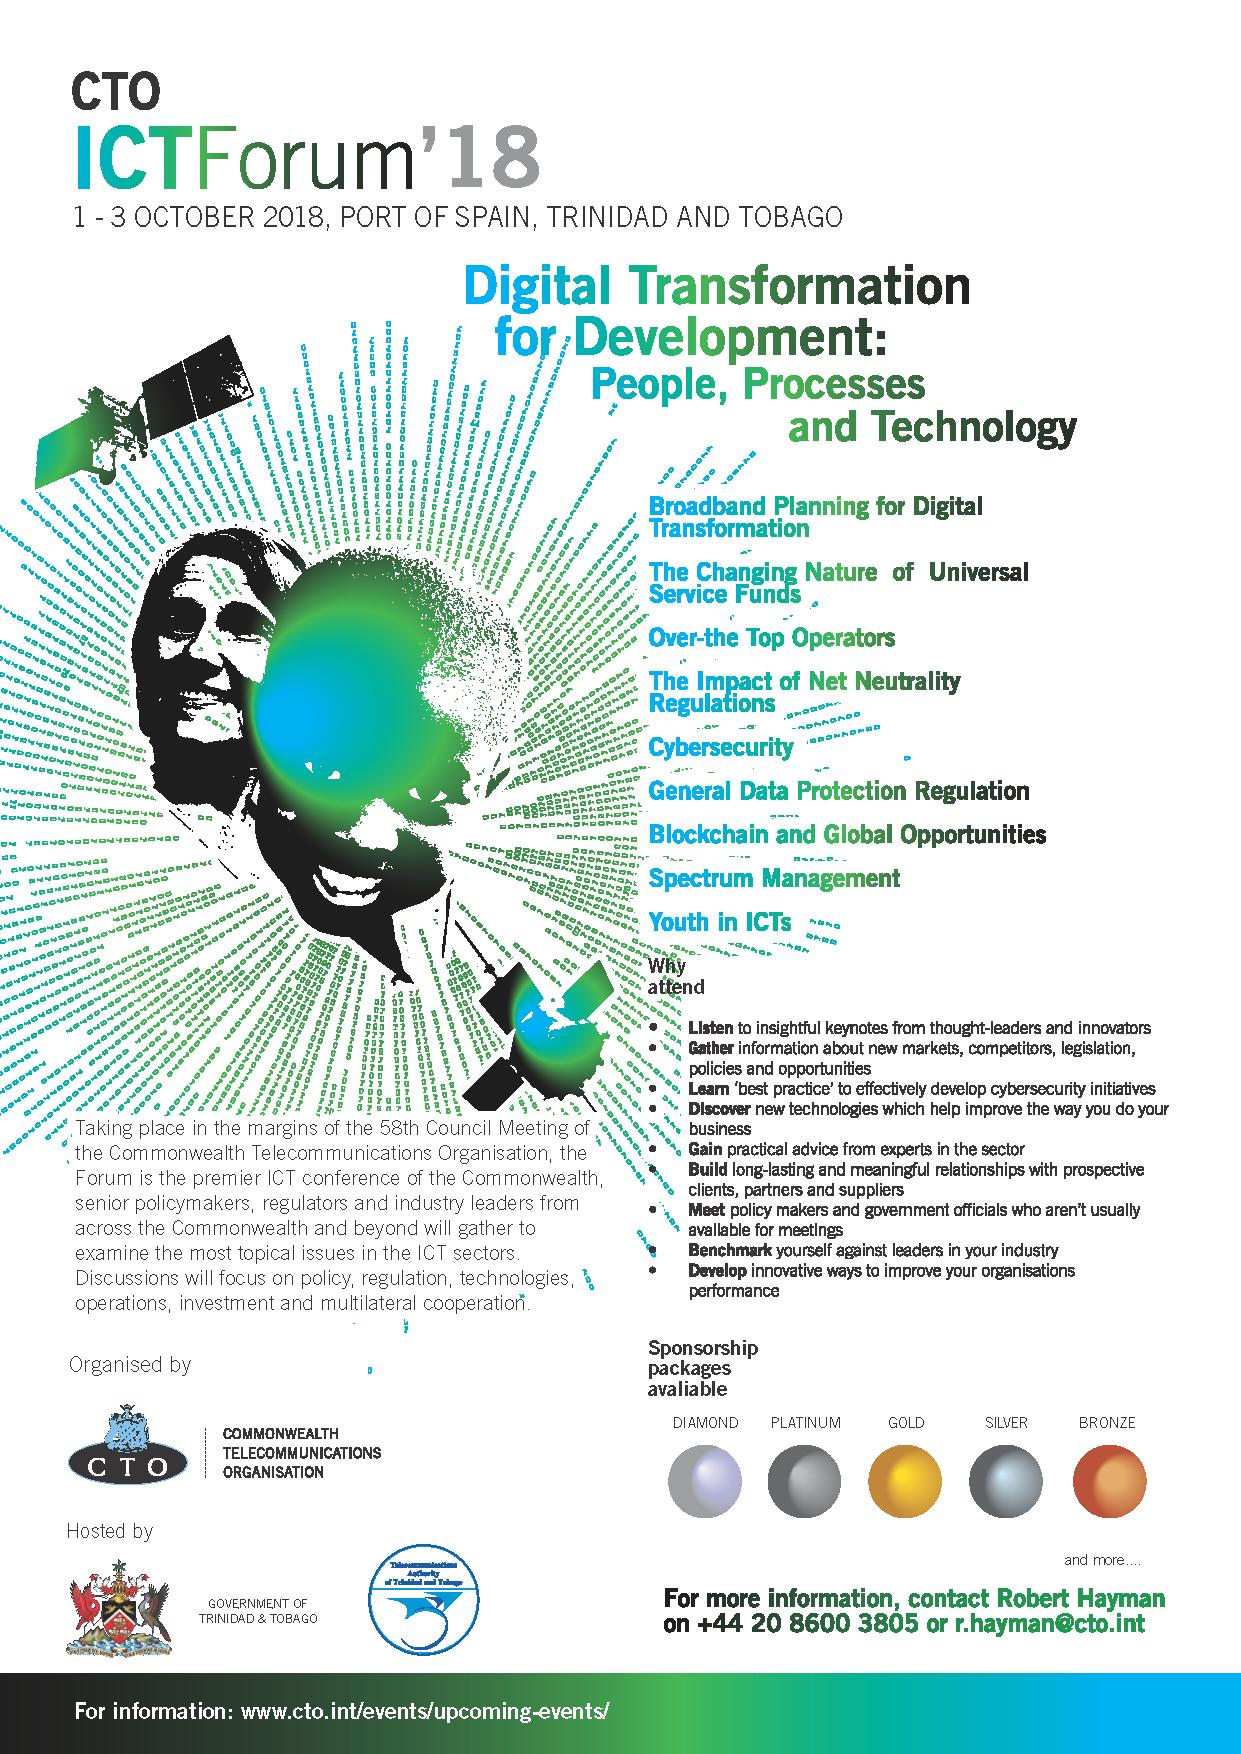 https://tatt.org.tt/Portals/0/Documents/ADS/CT0-Forum-2018-Flyer2.png